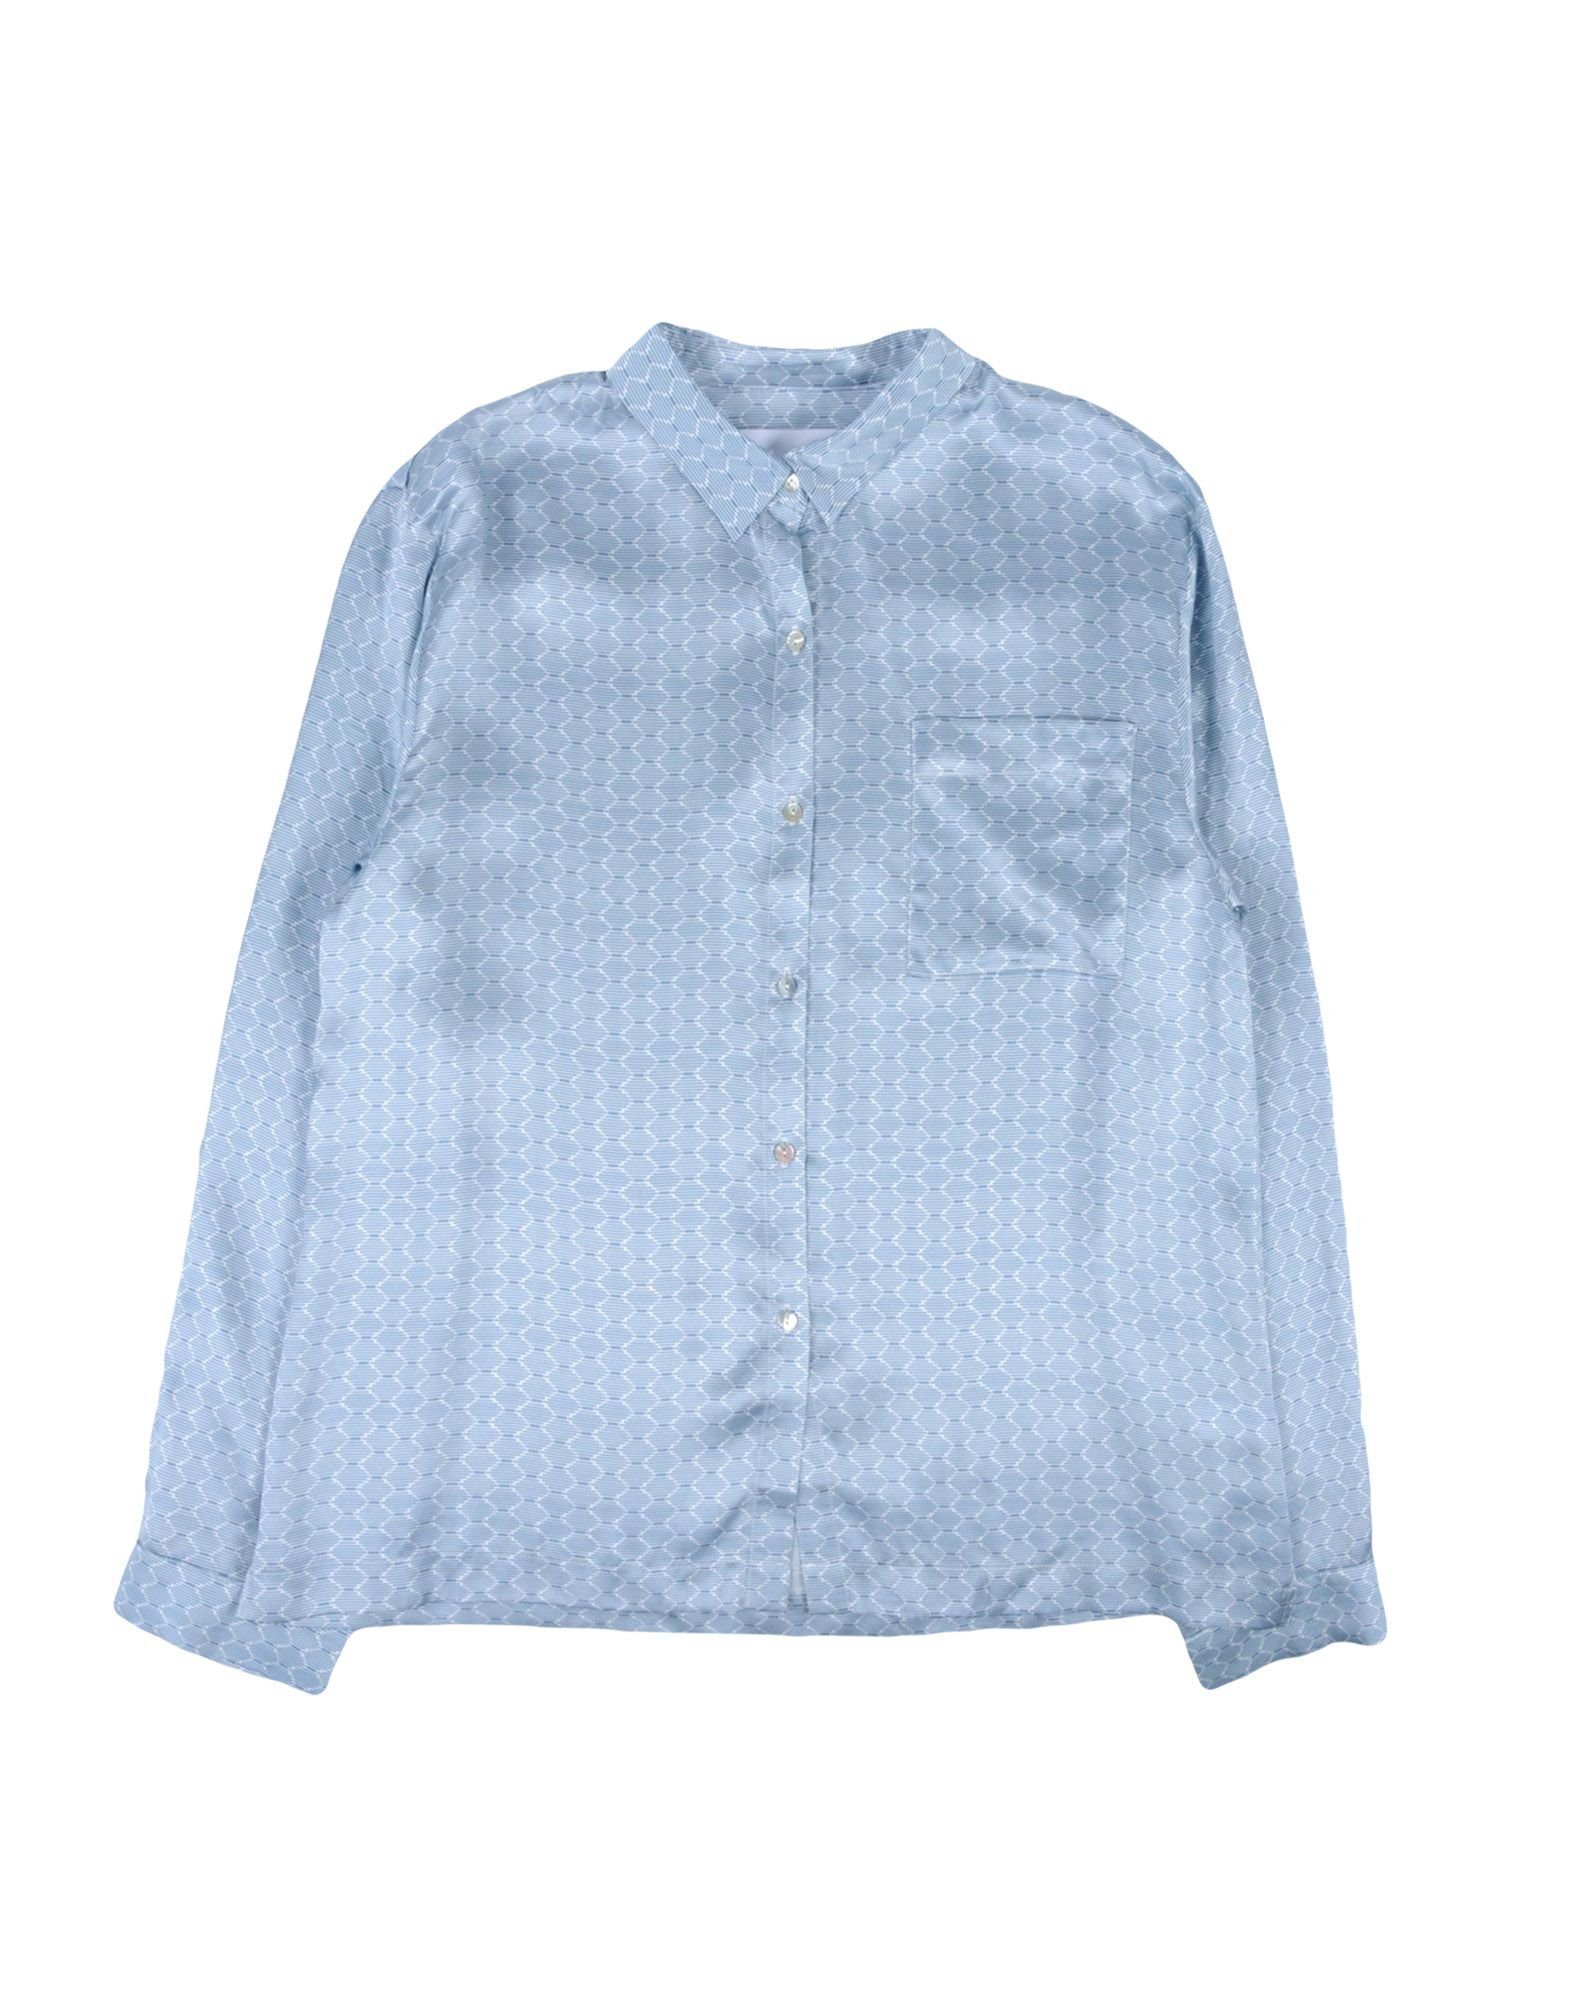 Asceno Sleepwear